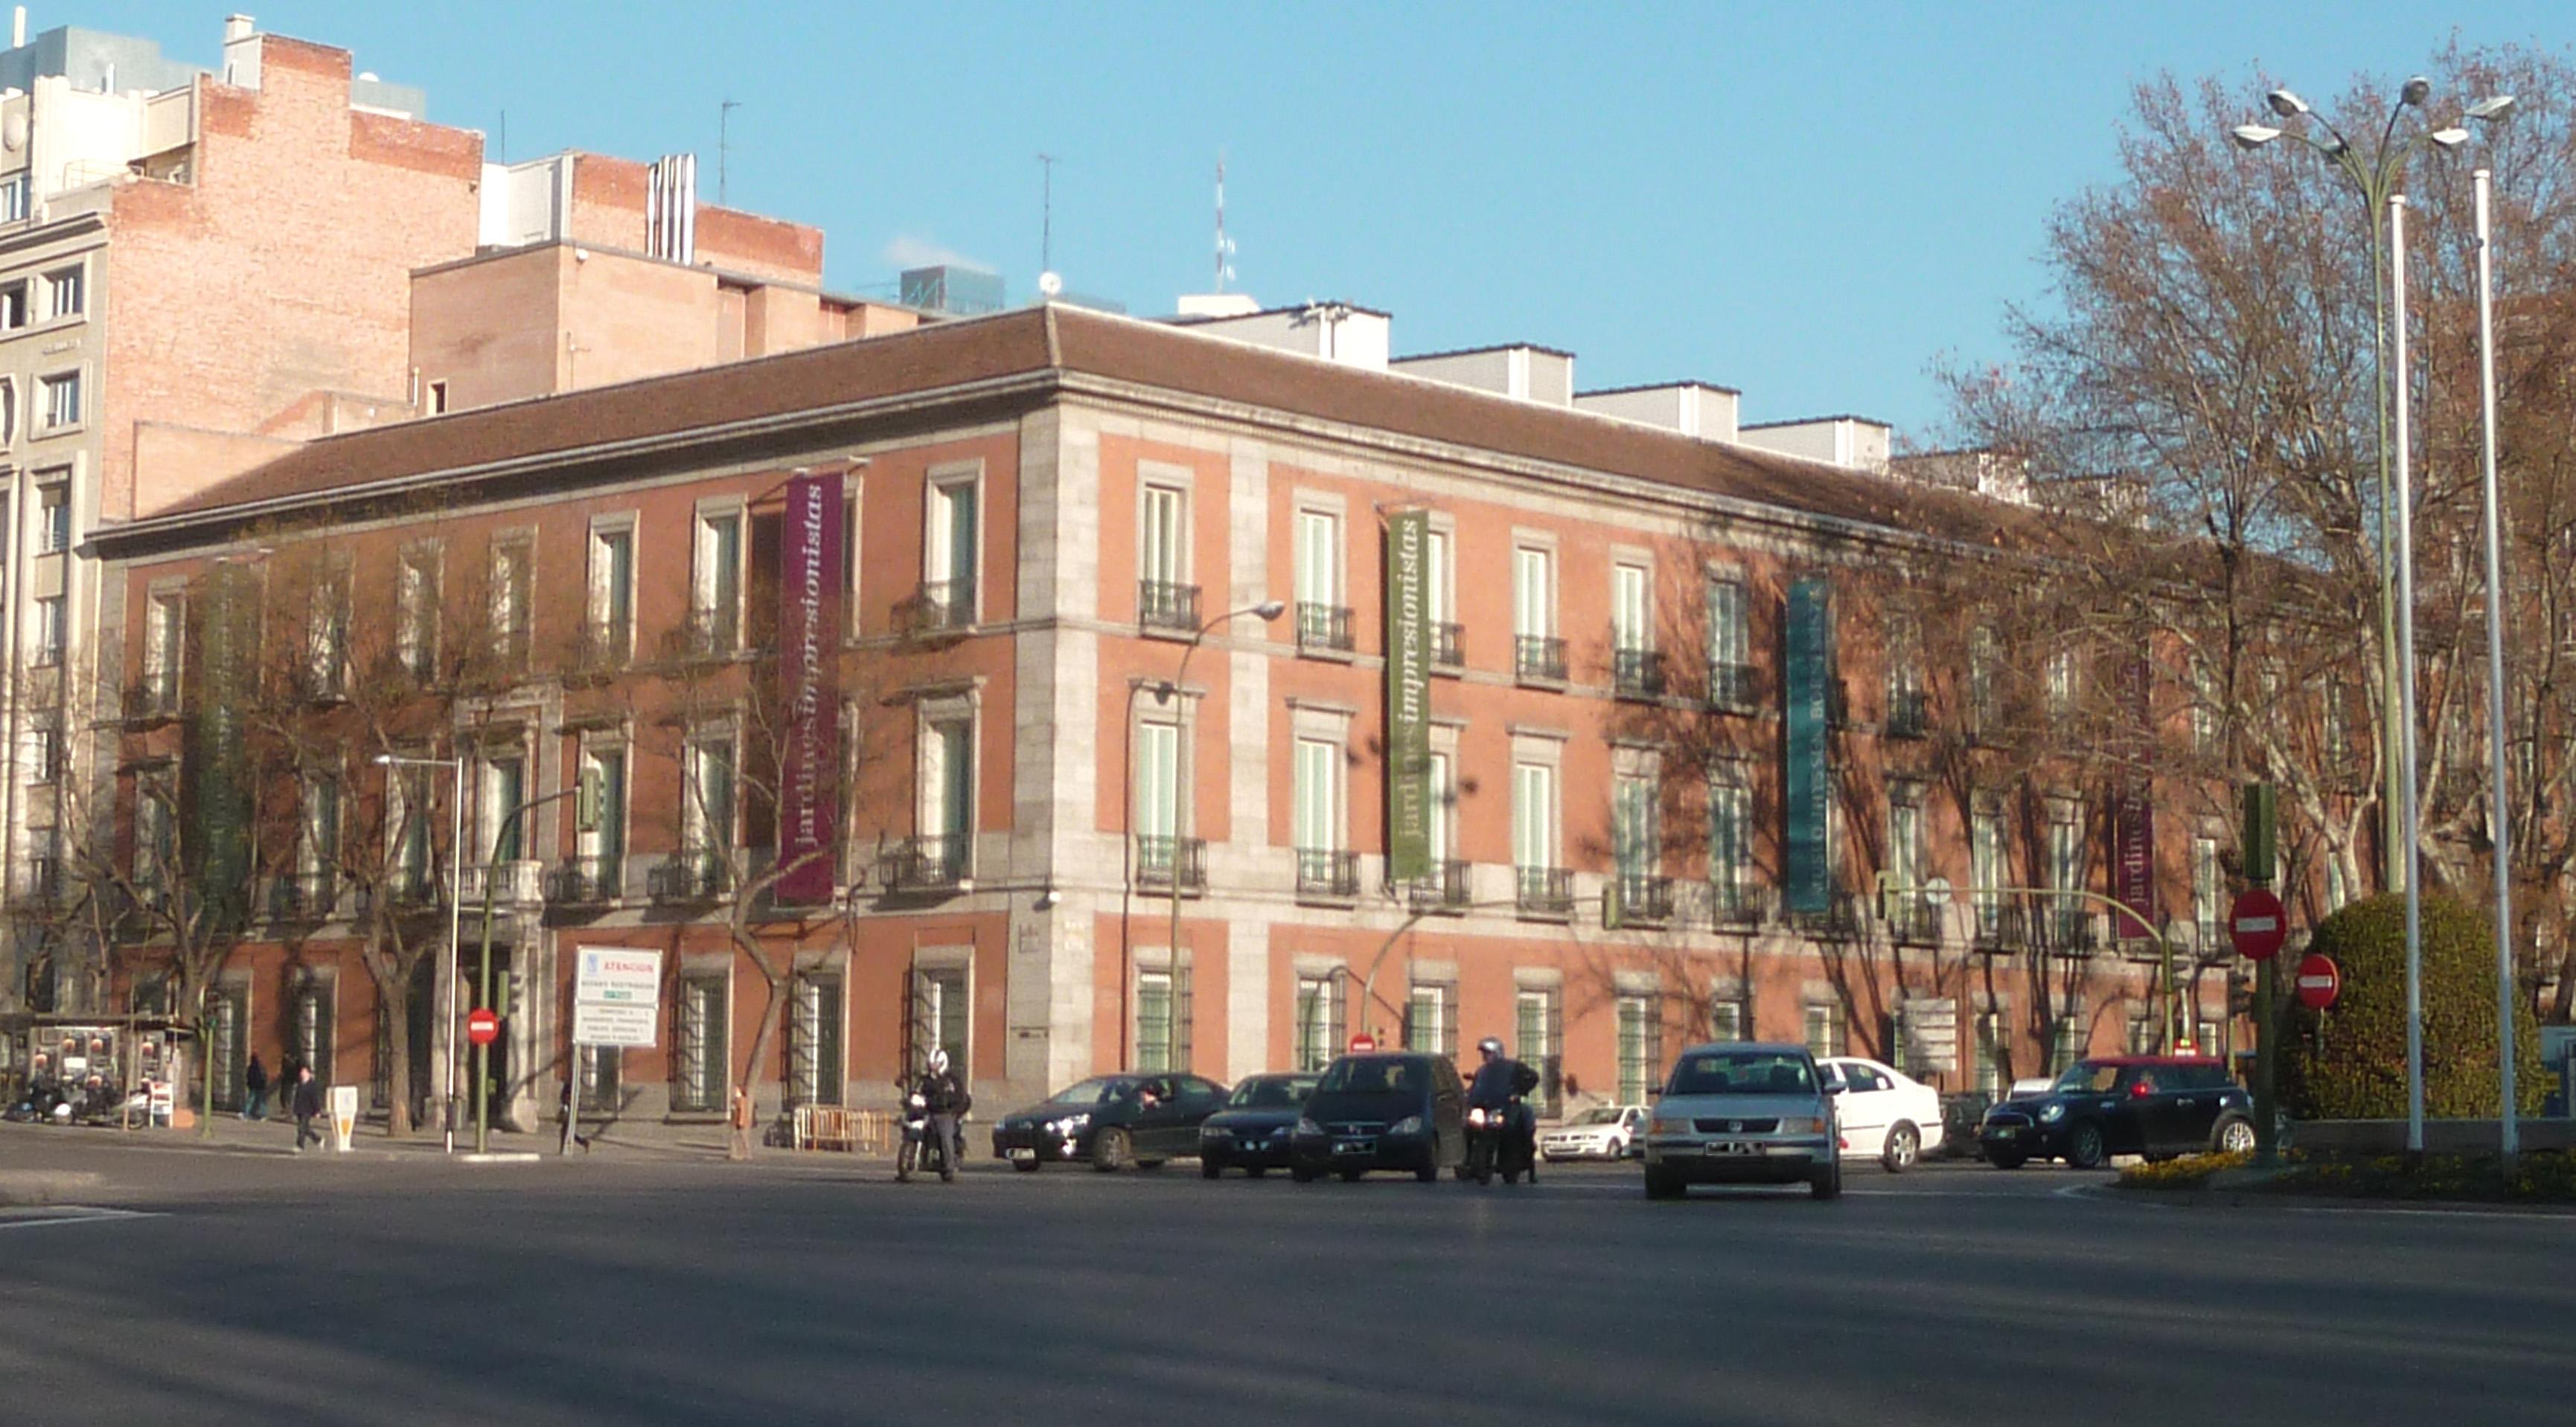 File:Museo Thyssen-Bornemisza (Madrid) 06b.jpg - Wikimedia Commons